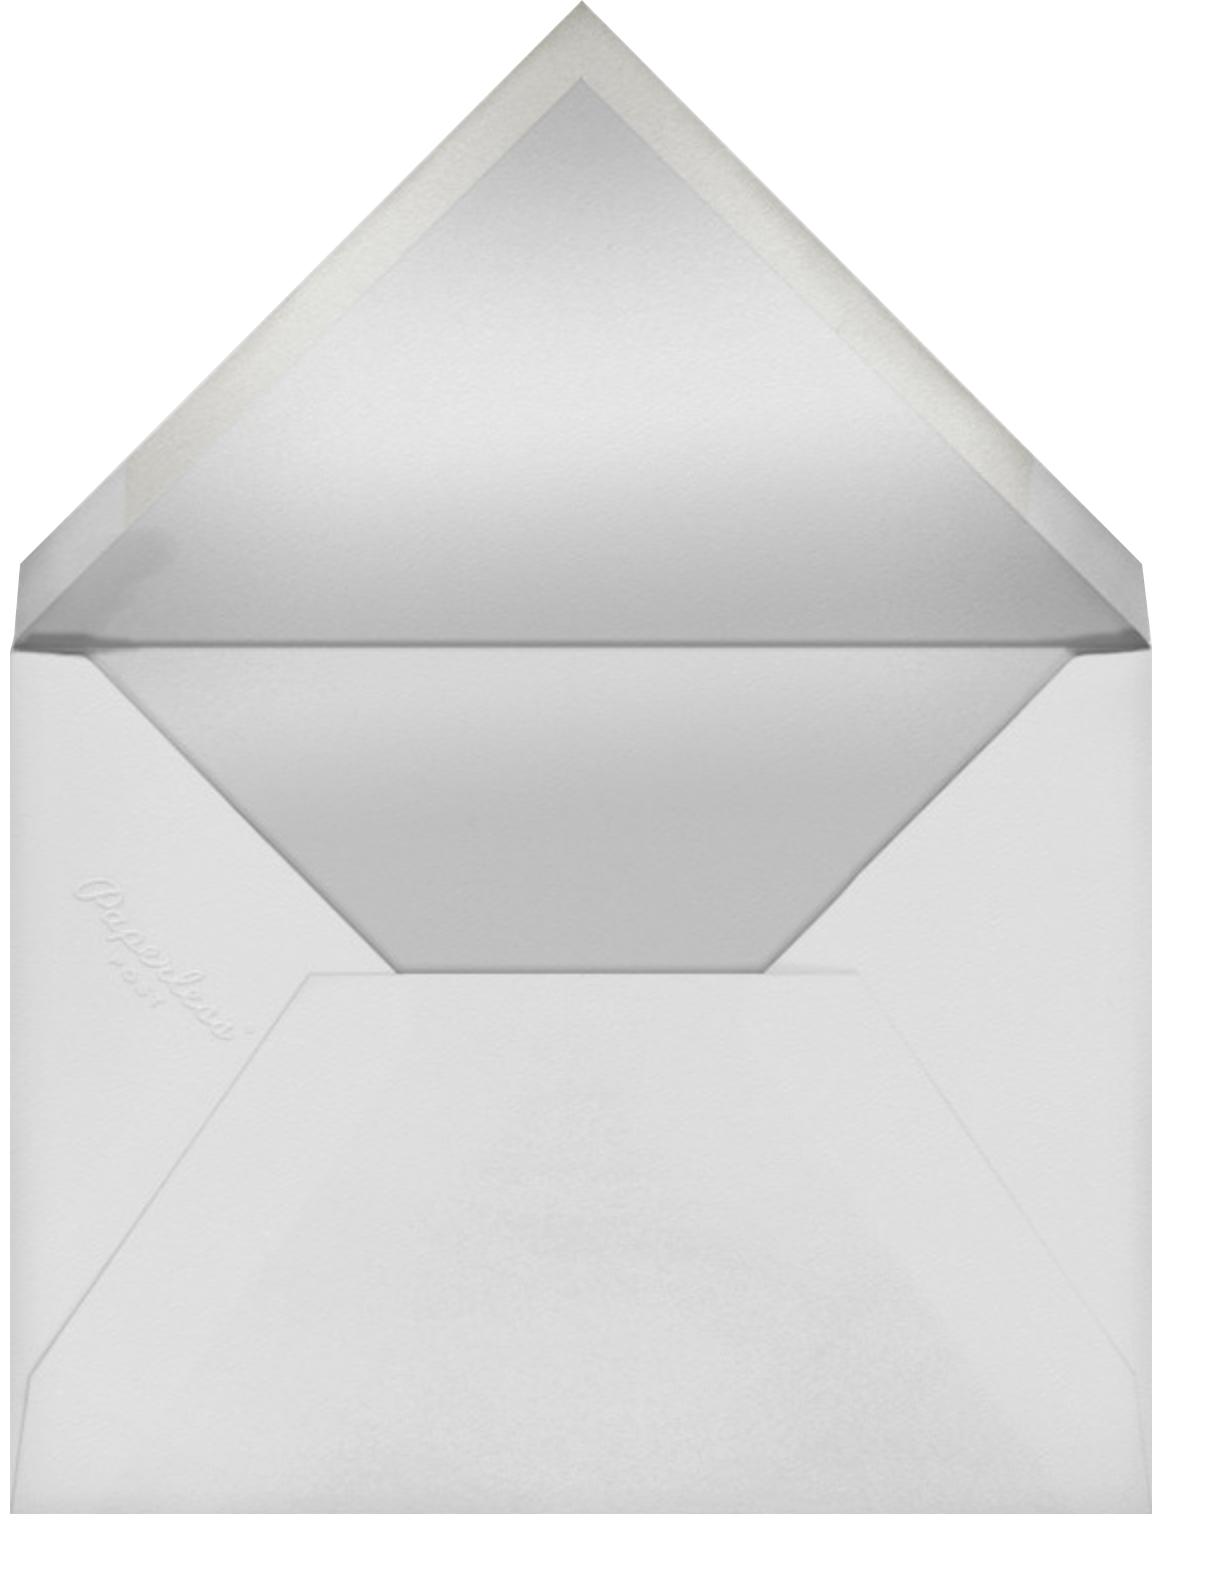 Savoy (Tall) - Emerald - Paperless Post - Envelope